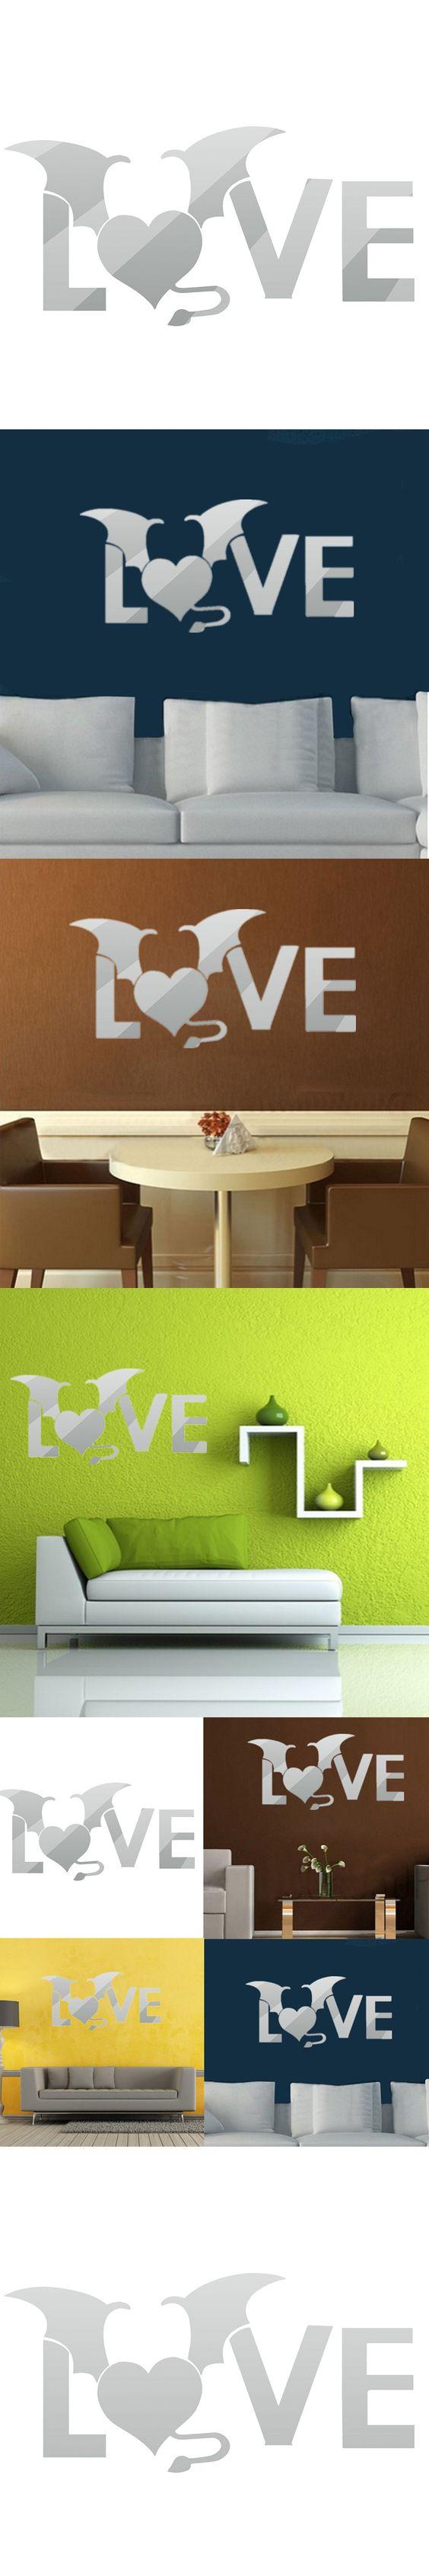 Best Gifts DIY 3D LOVE Acrylic Mirror Wall Sticker Modern Art Home Office Kids Bedroom Decoration Decals